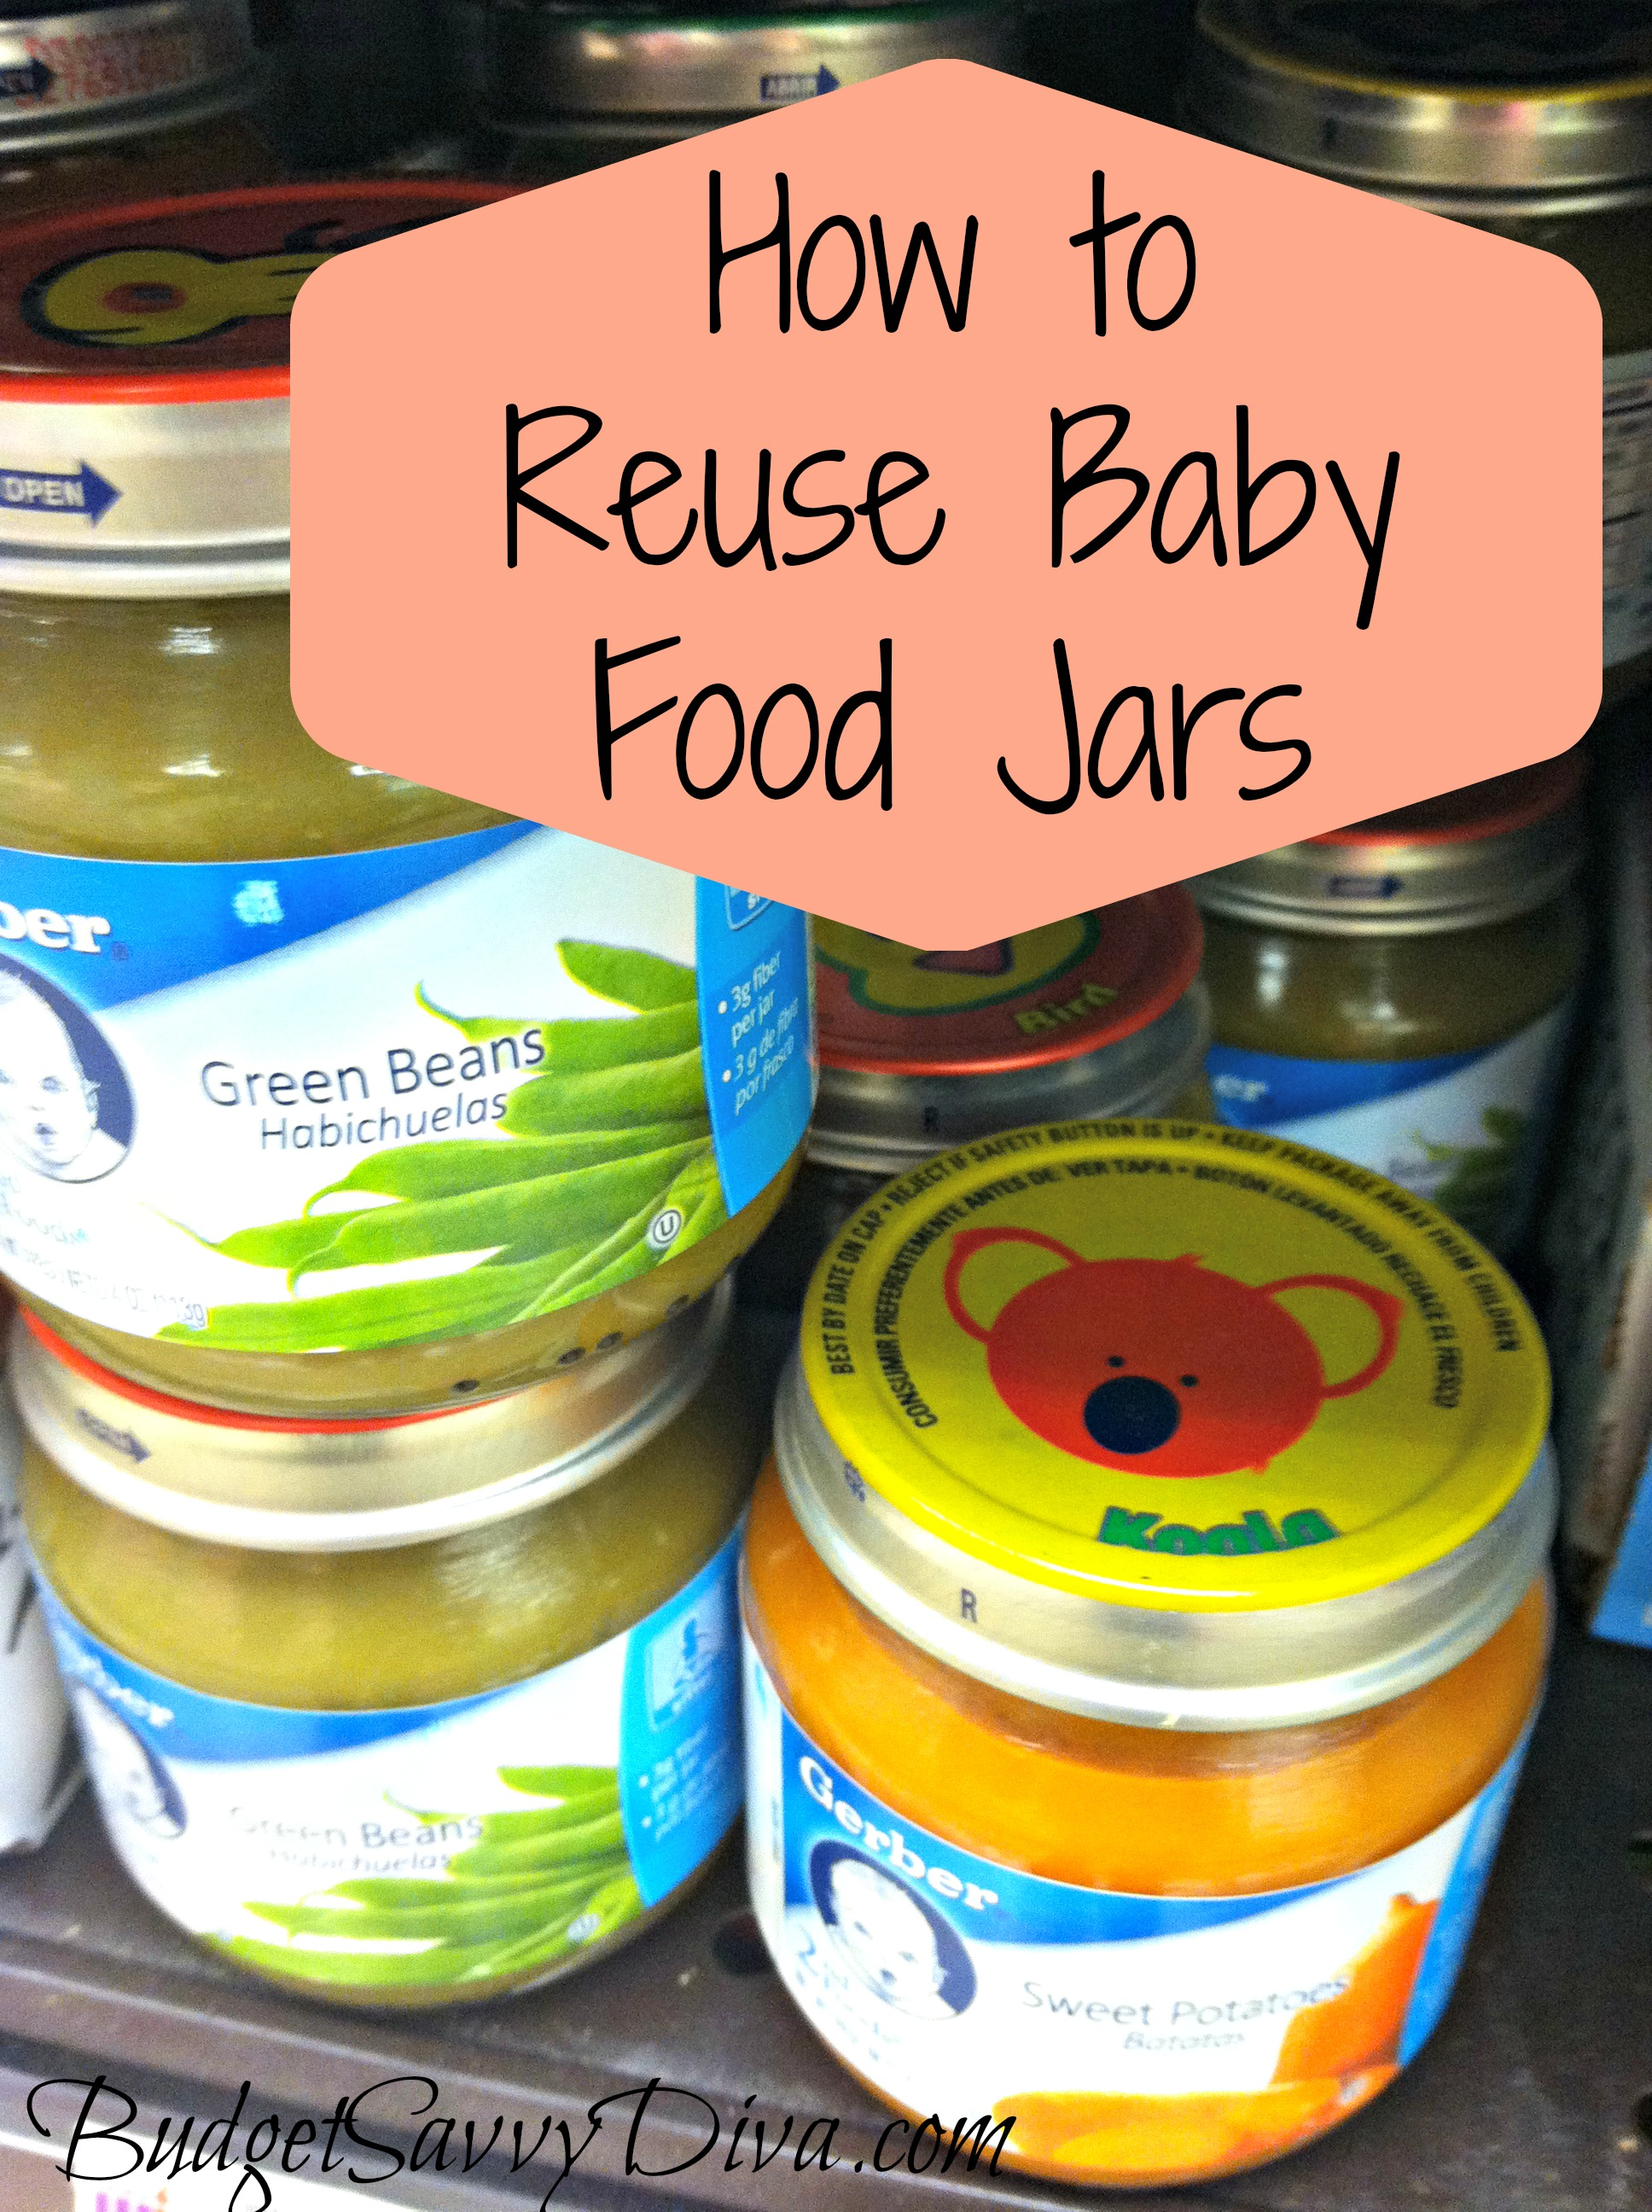 How To Reuse Baby Food Jars Budget Savvy Diva